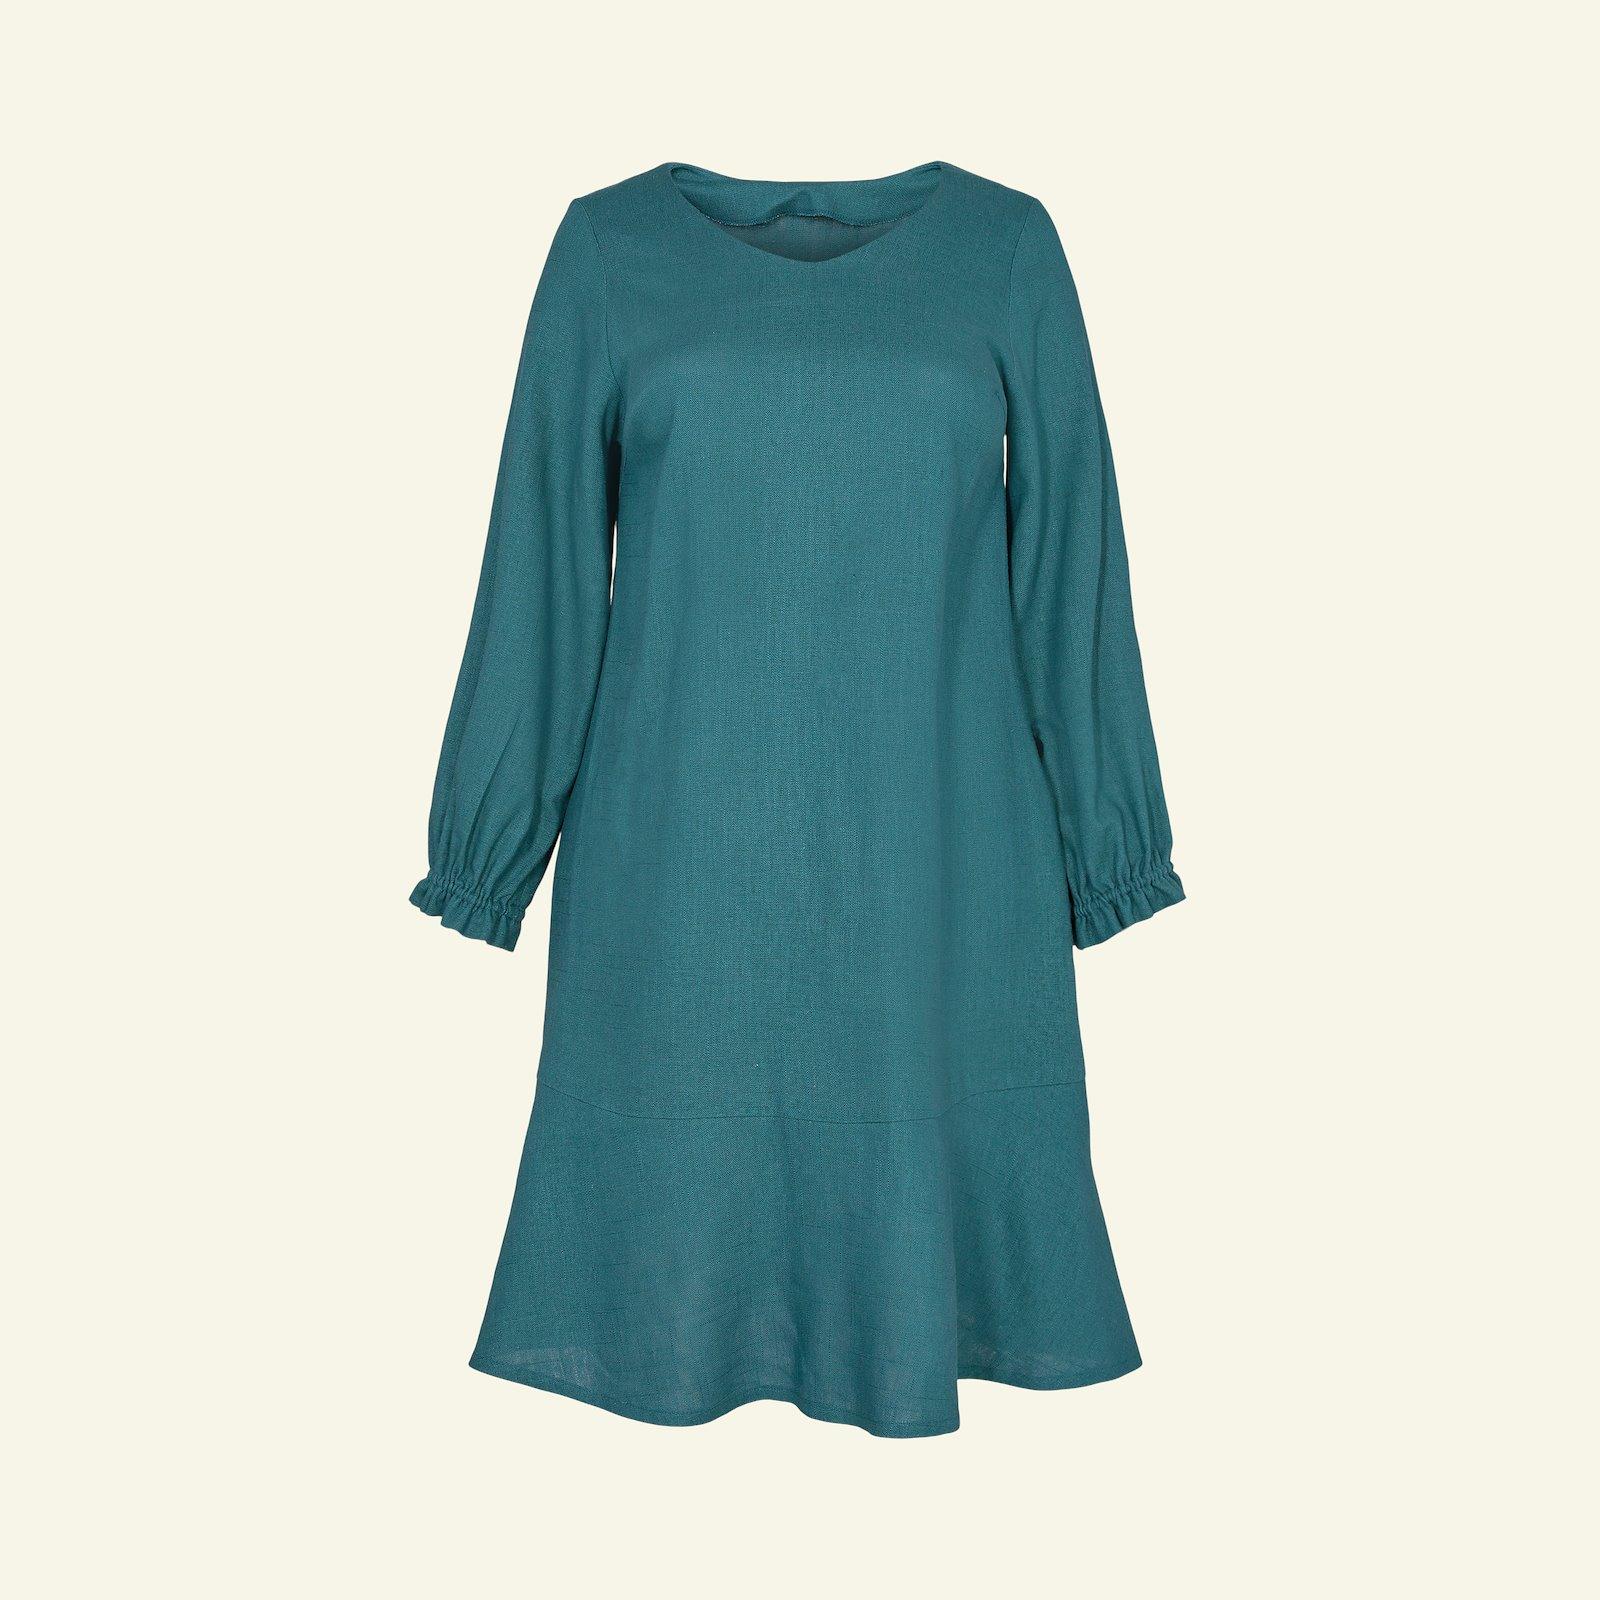 Linen/cotton petrol blue p73018_410129_sskit